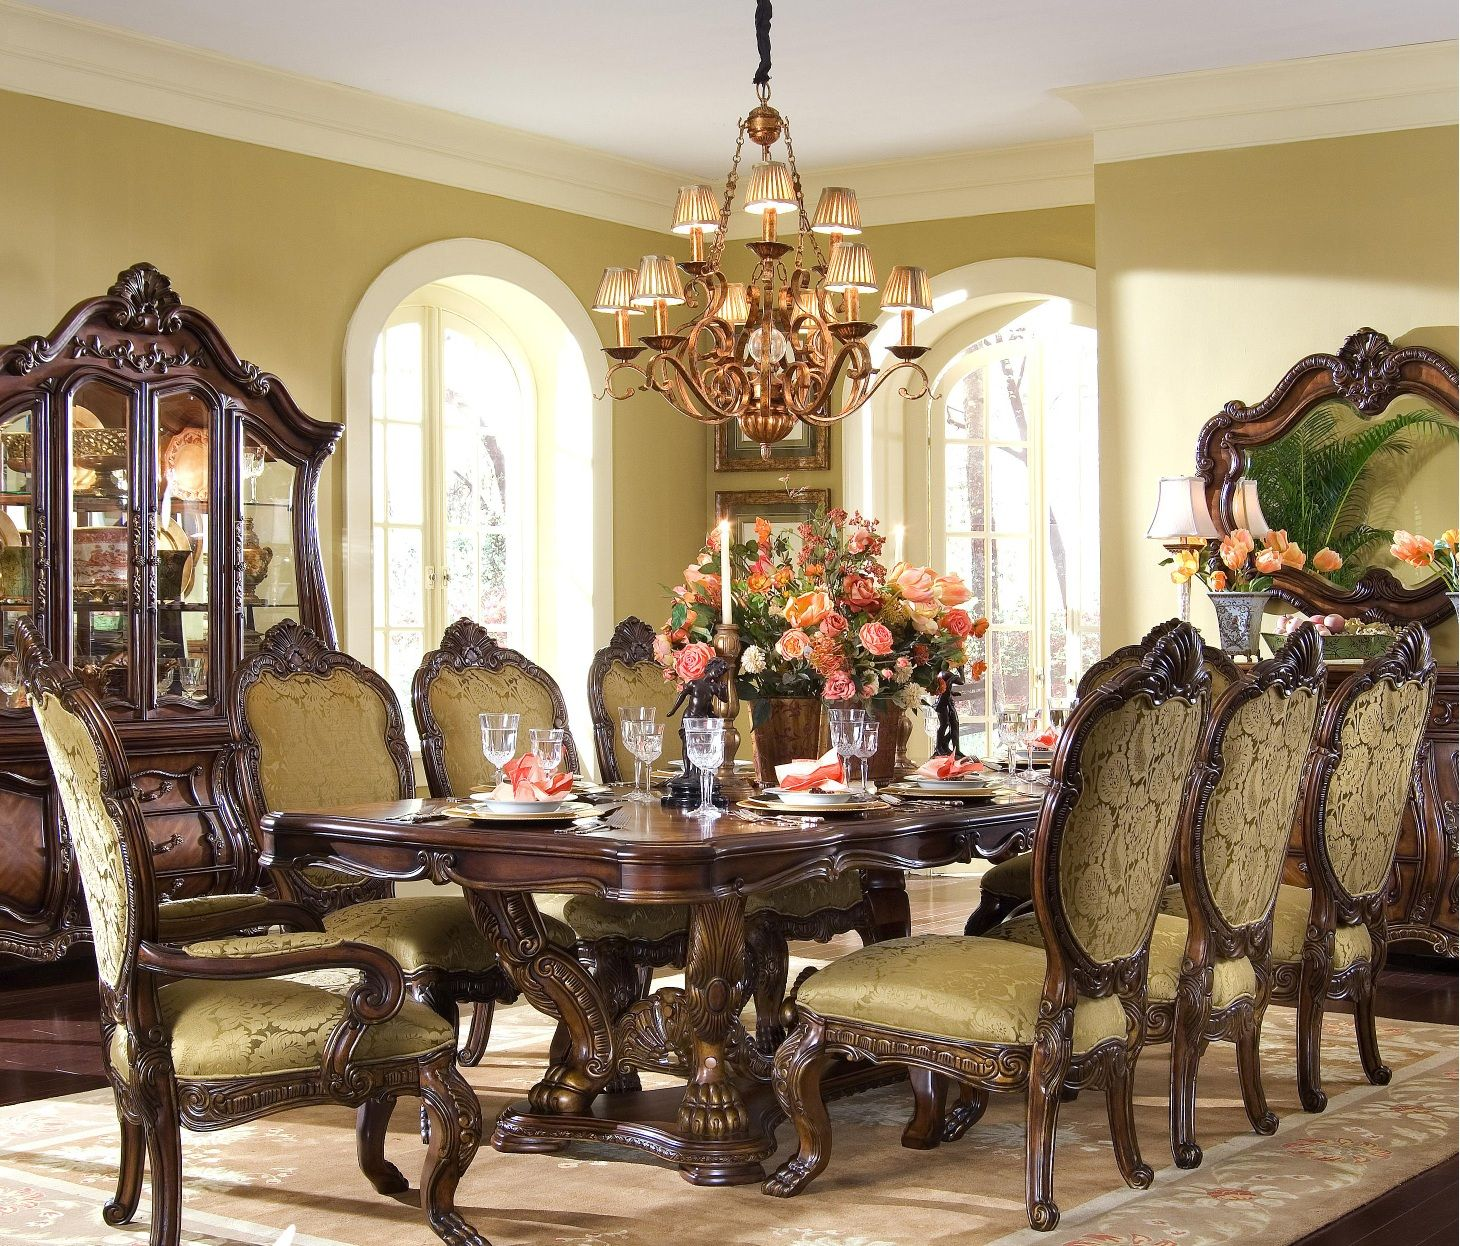 Victorian Dining Room: Victorian Dining Room